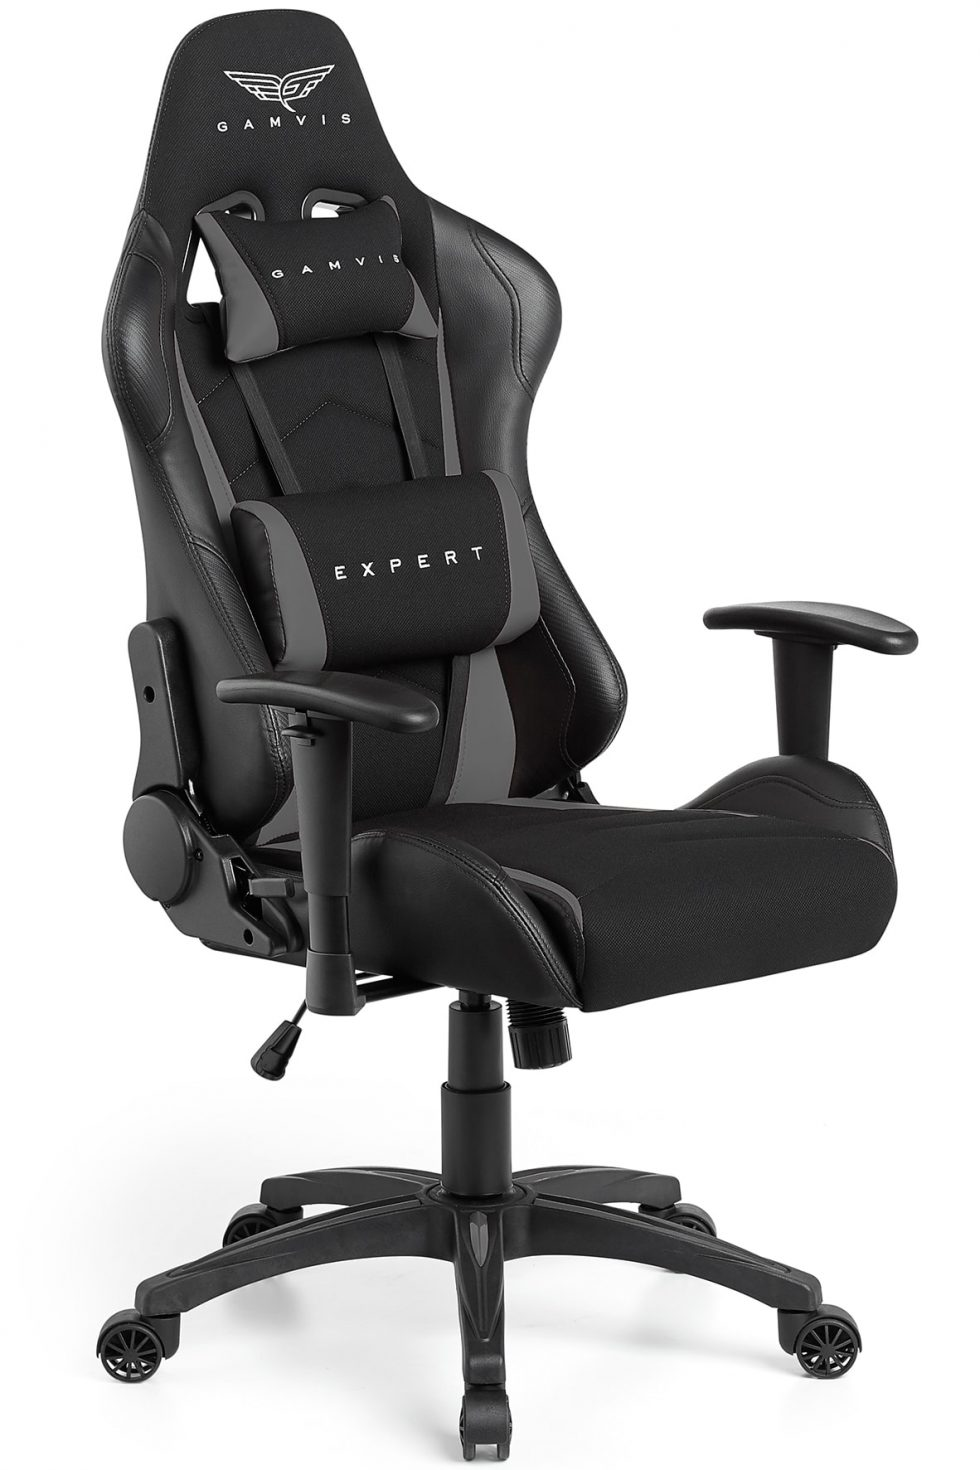 Gamvis Expert Gaming Chair Black Grey Fabric